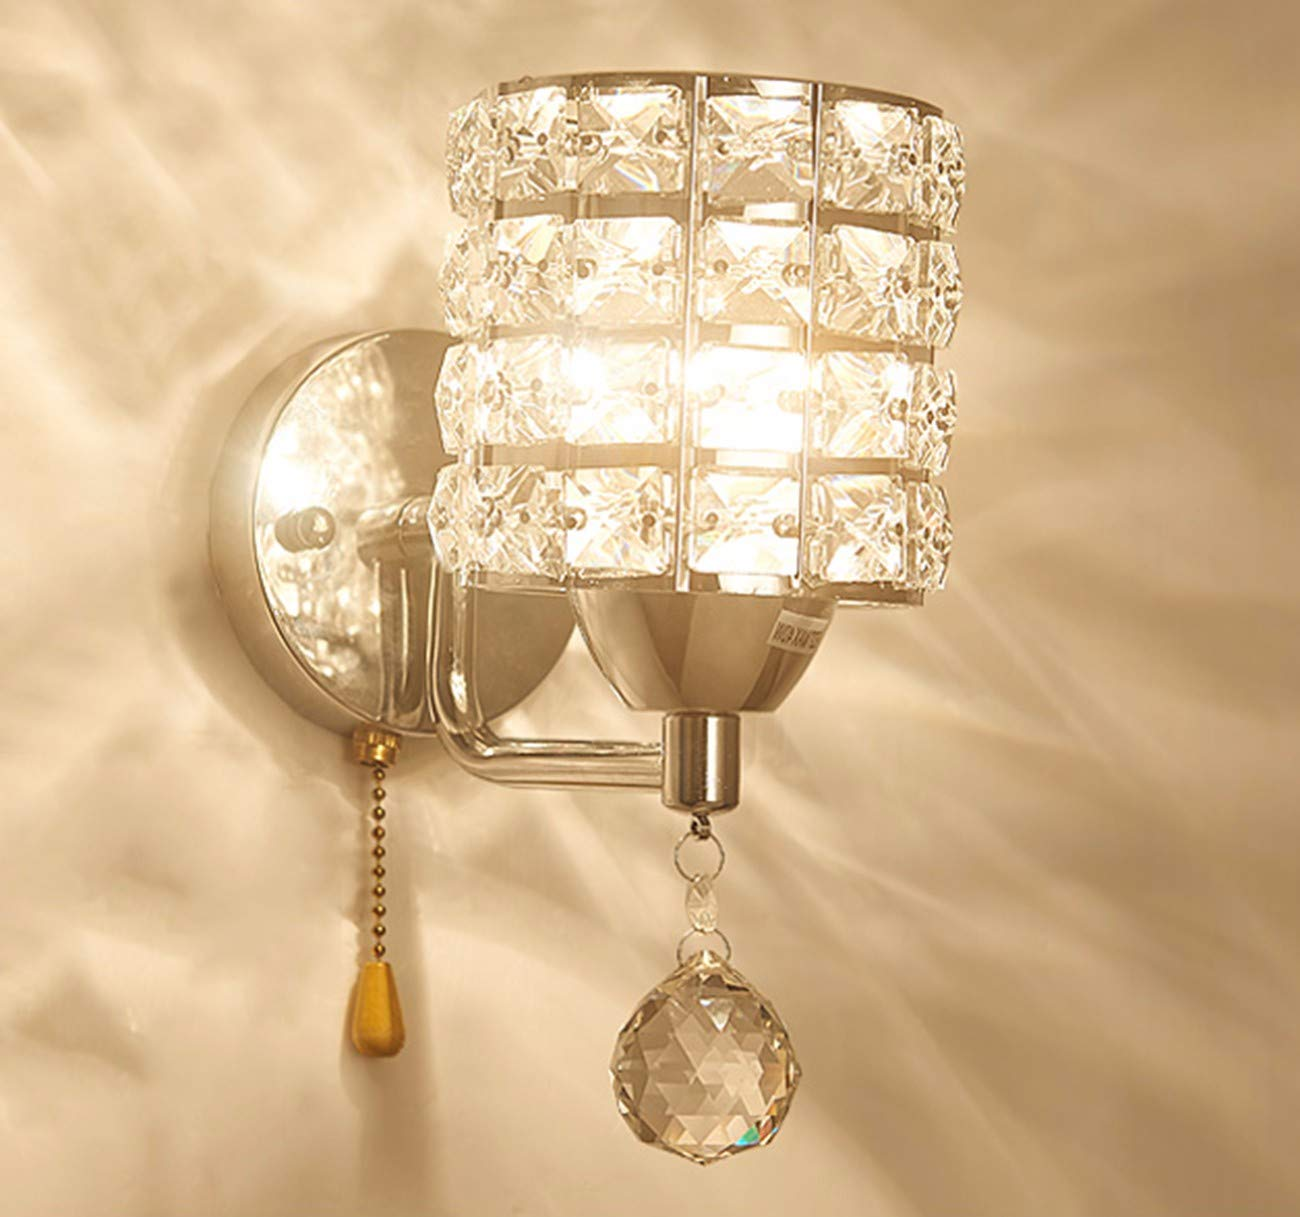 B wandleuchte Goldene Crystal Wand Lampe Raum Schlafzimmer Mit Lampe - Lampe,B